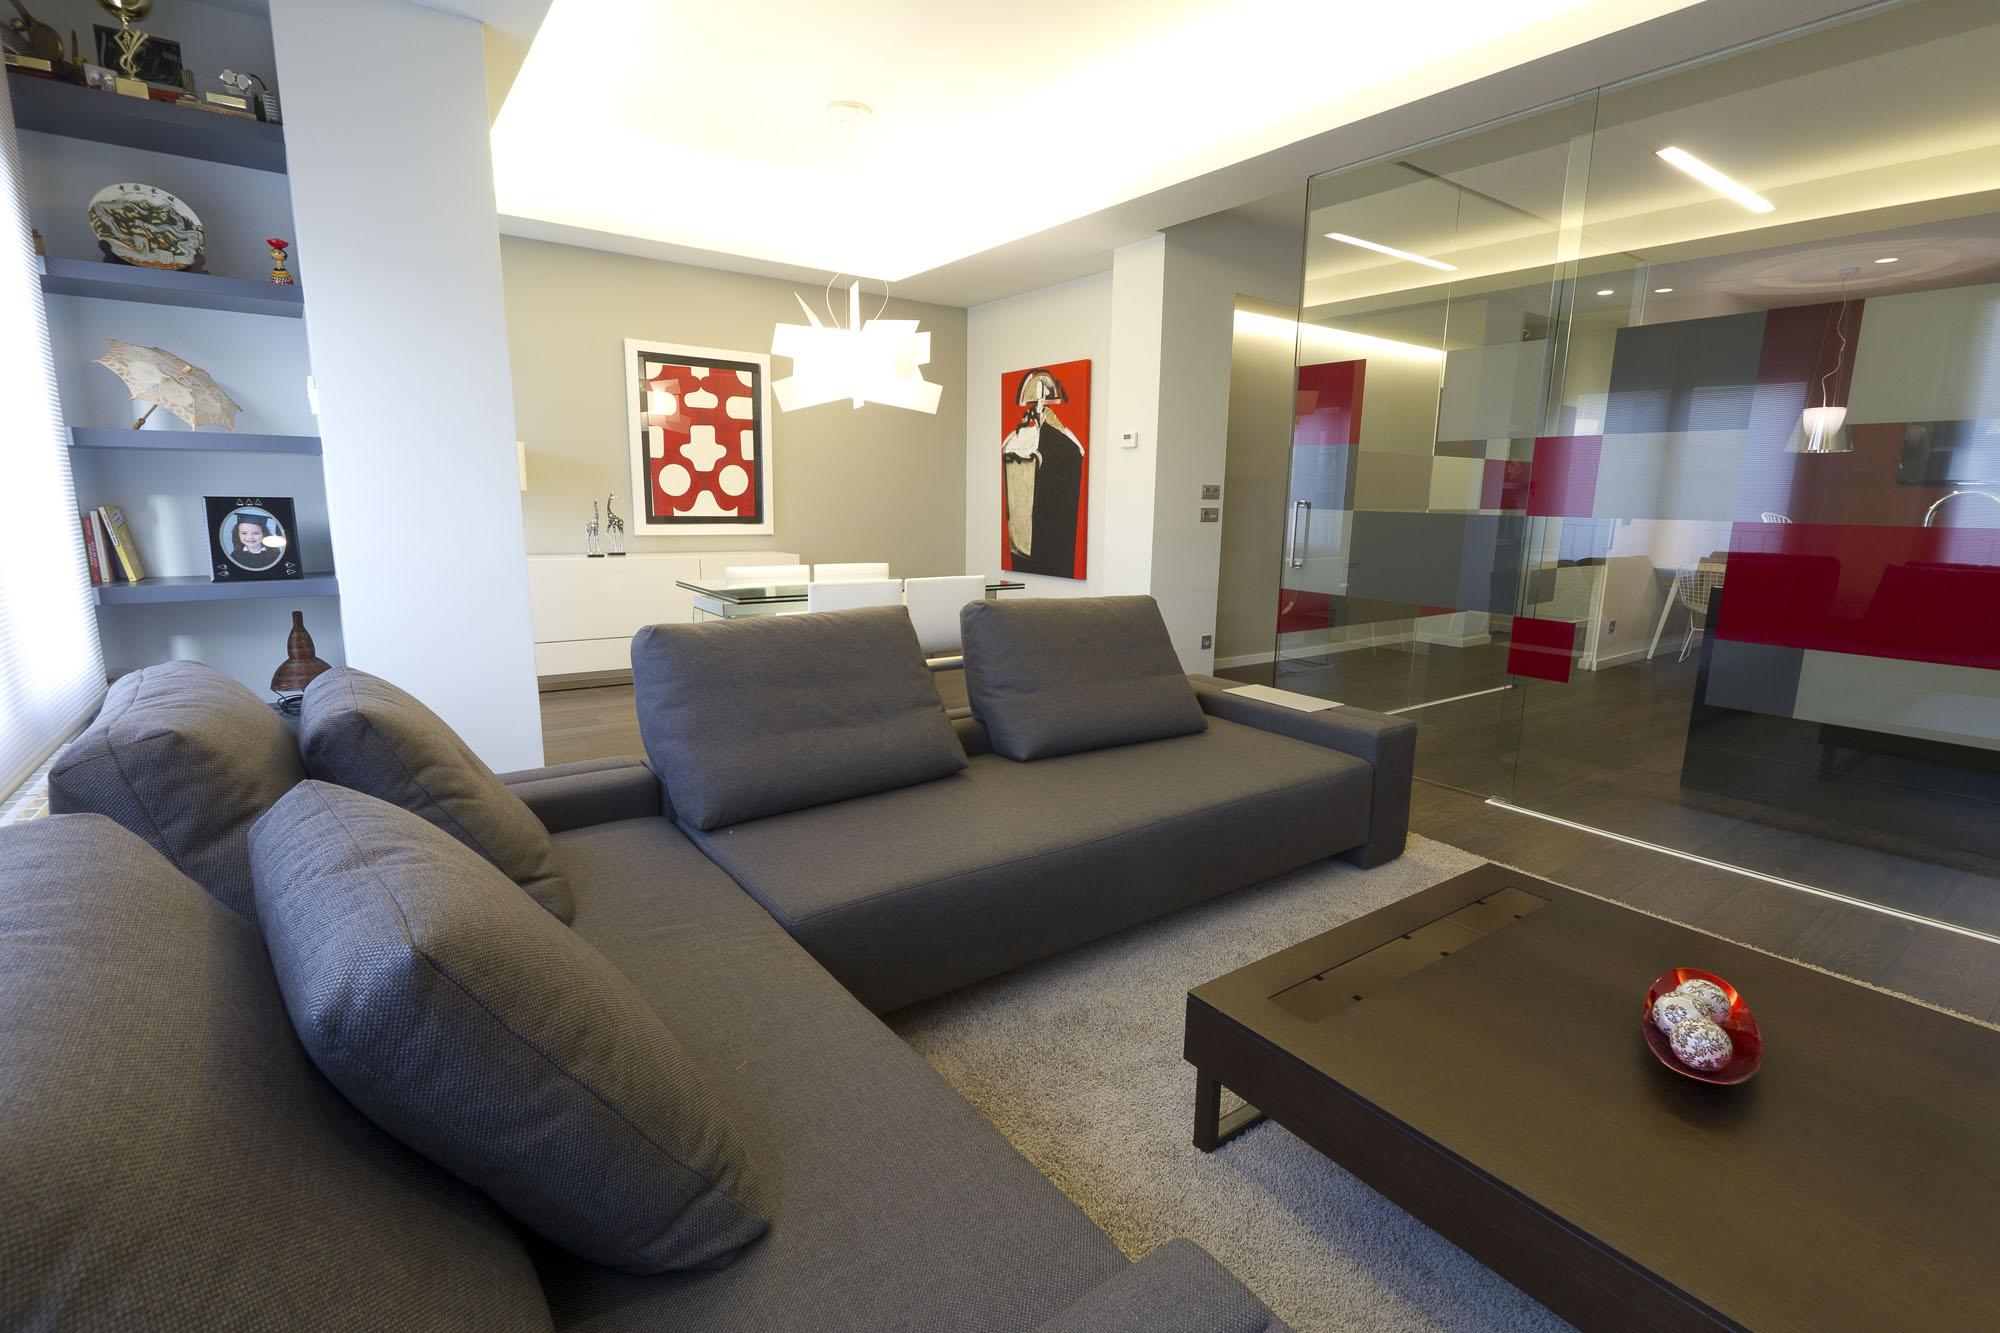 Pastor apartment by bano arquitectura de interiores - Arquitectura de interiores ...